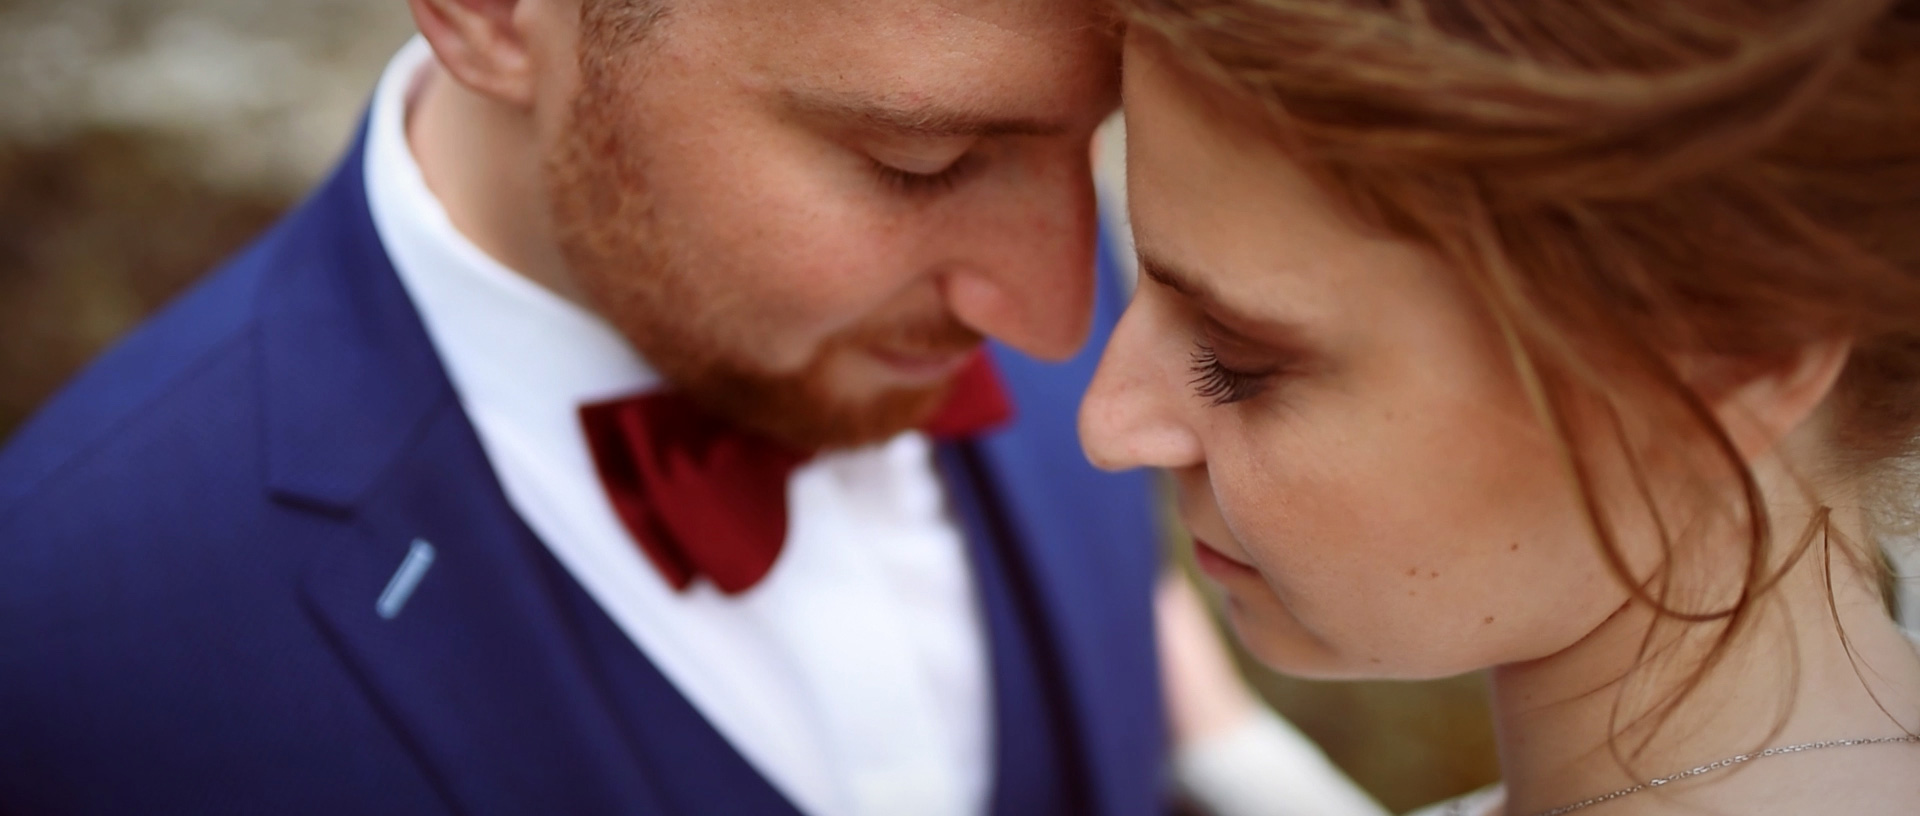 Vidéaste mariage juif - cérémonie synagogue - Luxembourg - Abbaye Neumunster